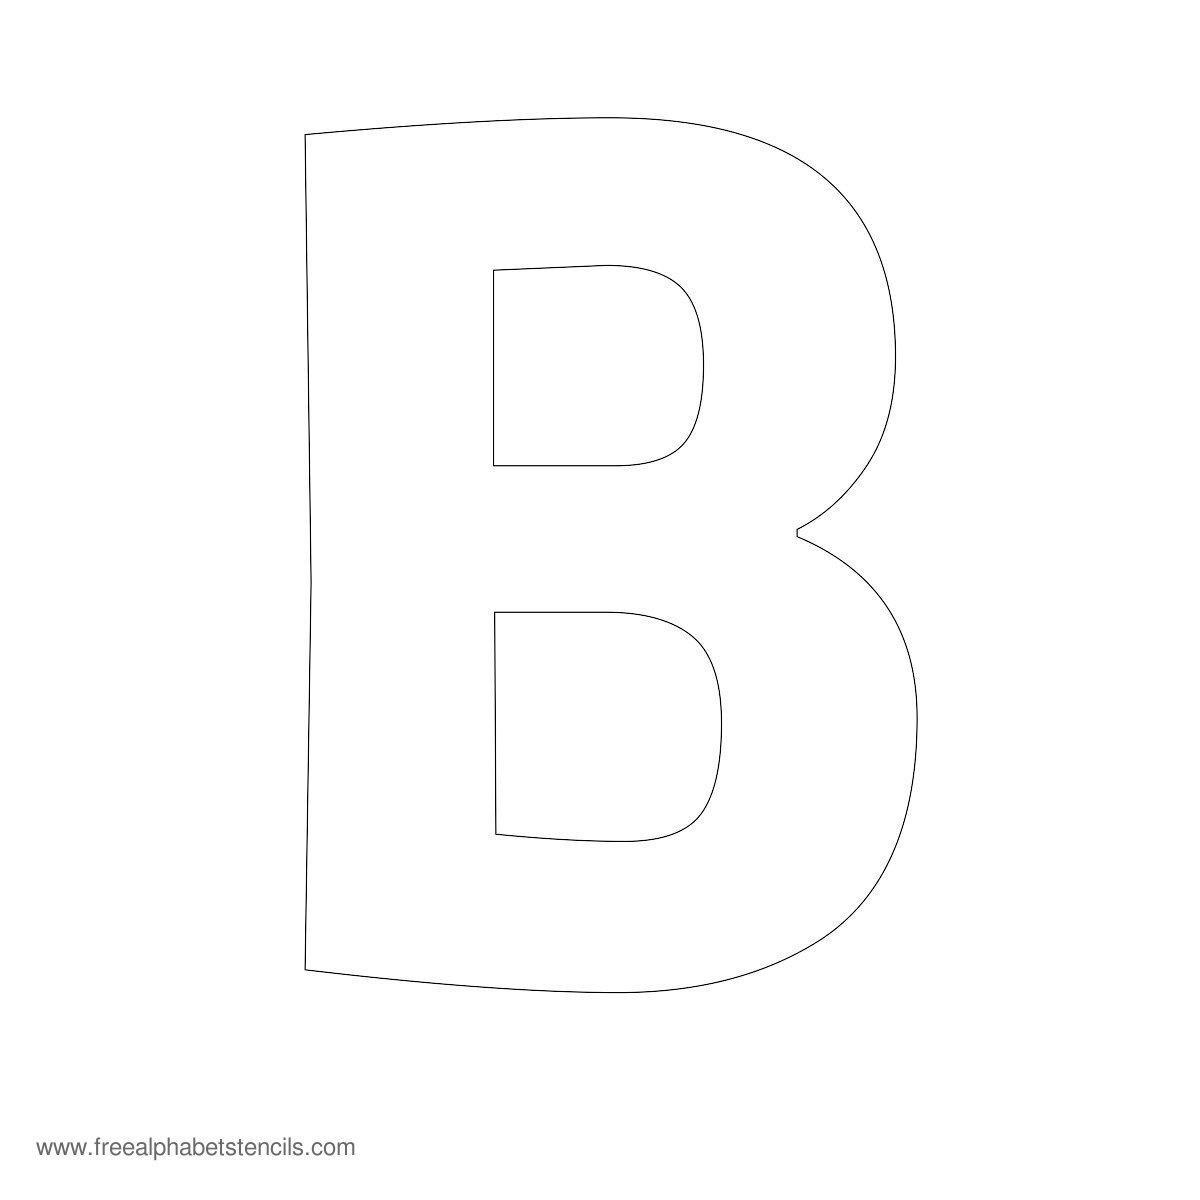 Large Alphabet Stencils | Freealphabetstencils - Free Printable Large Letters